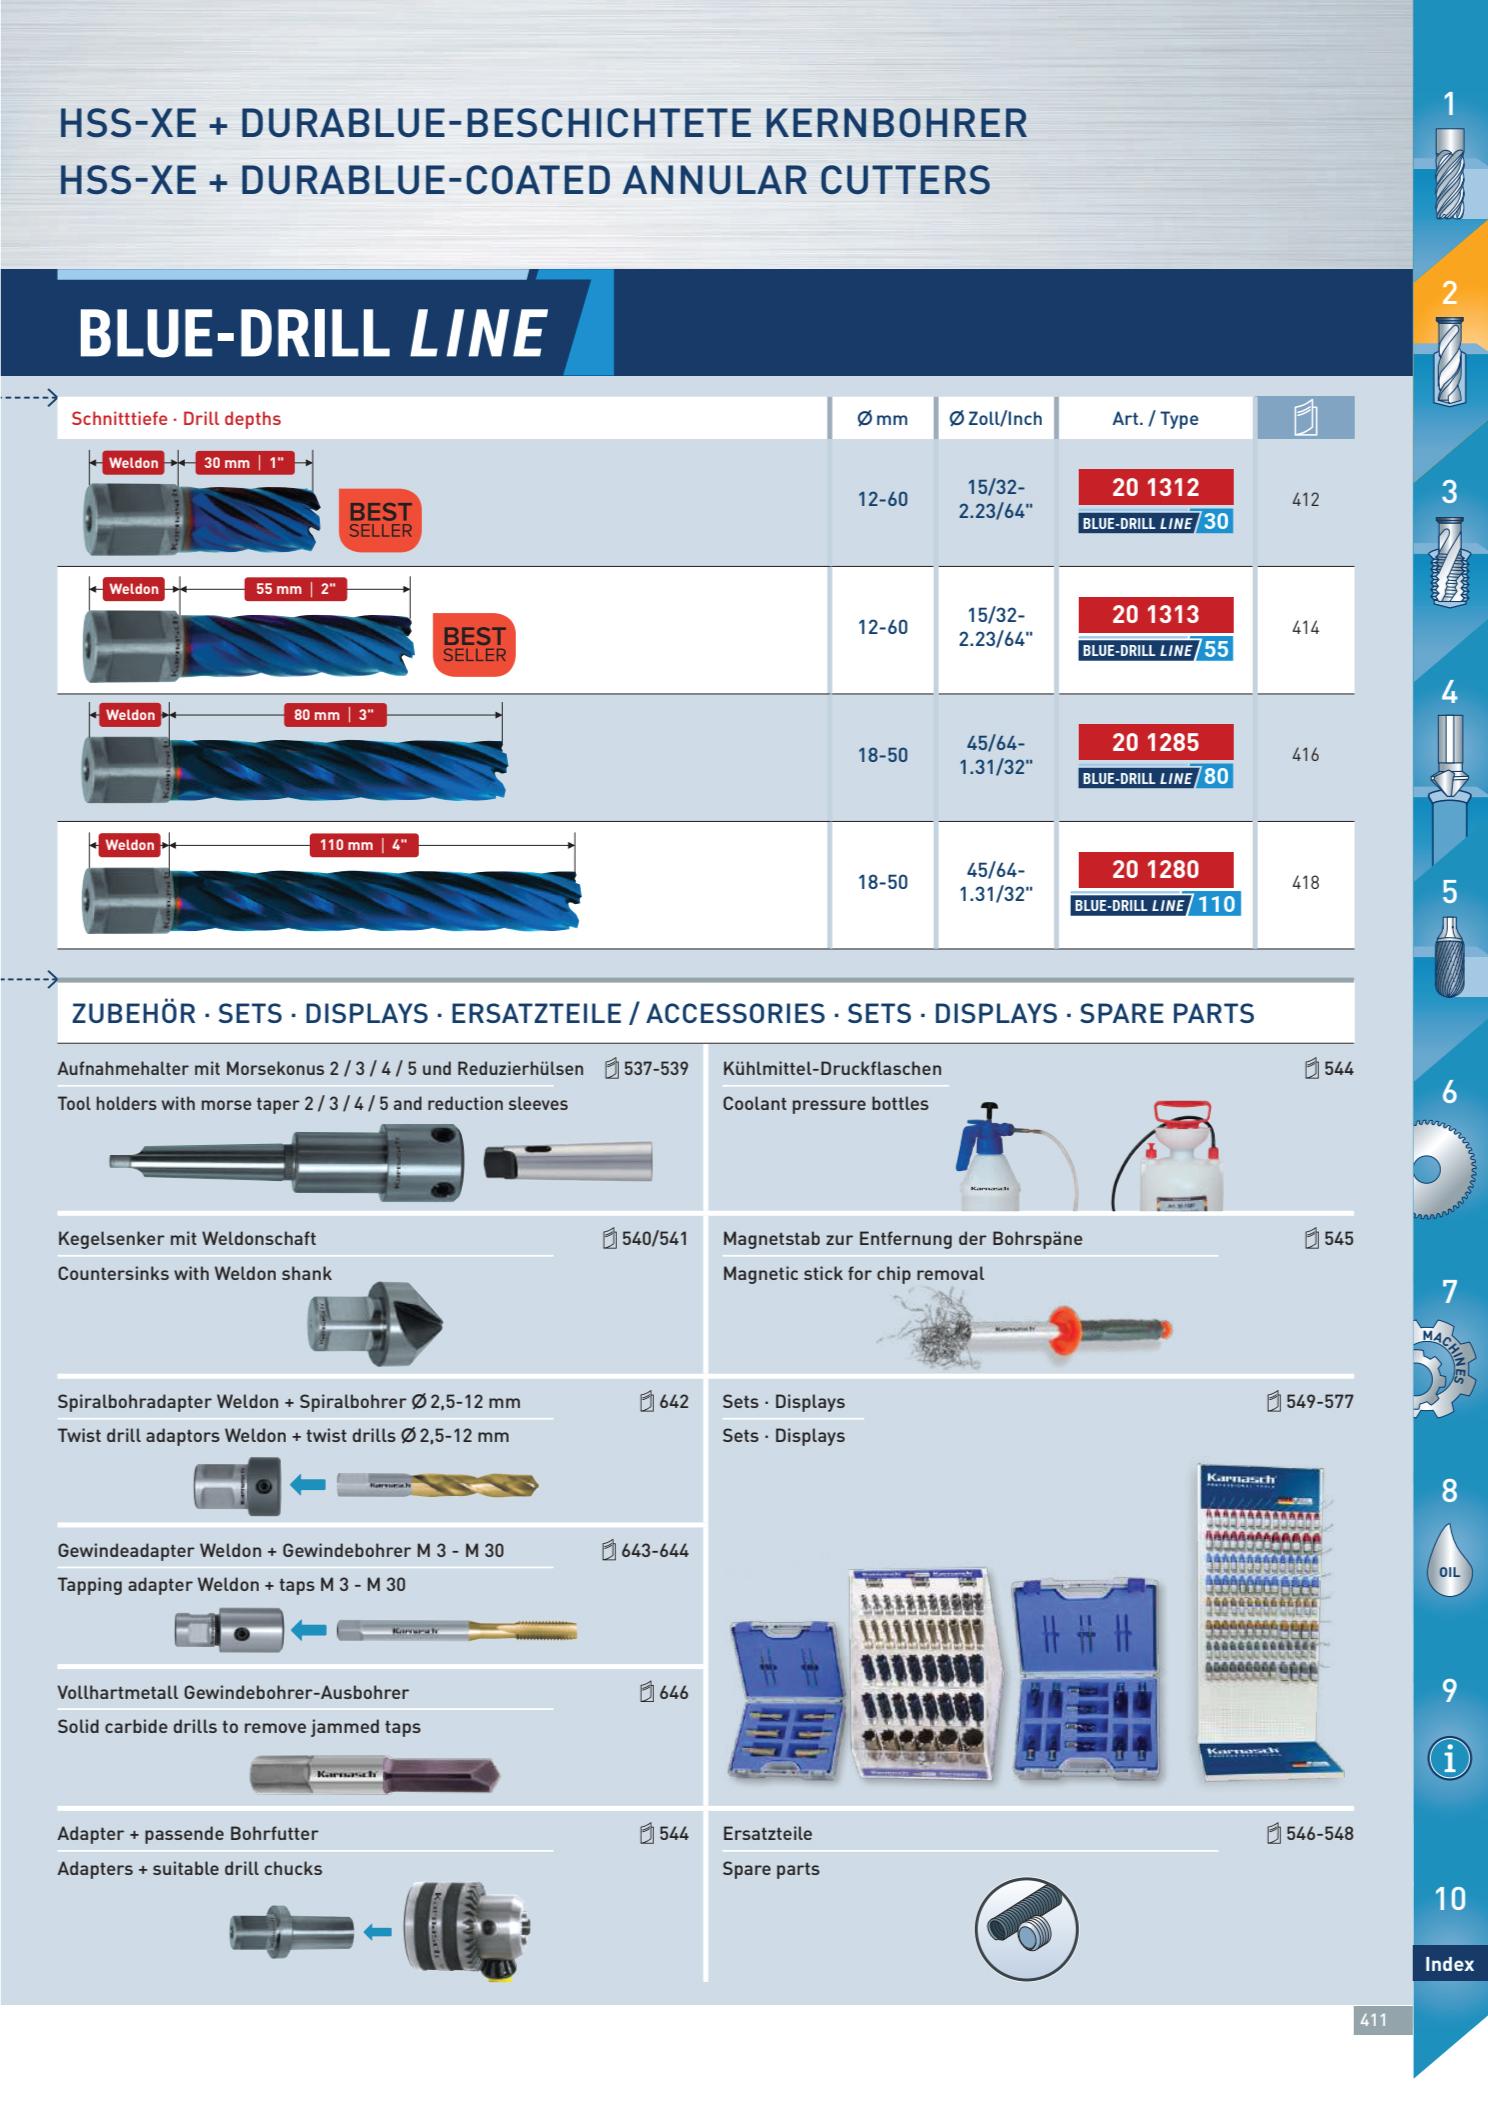 Mũi Khoan Từ Karnasch Blue-Drill Line 2